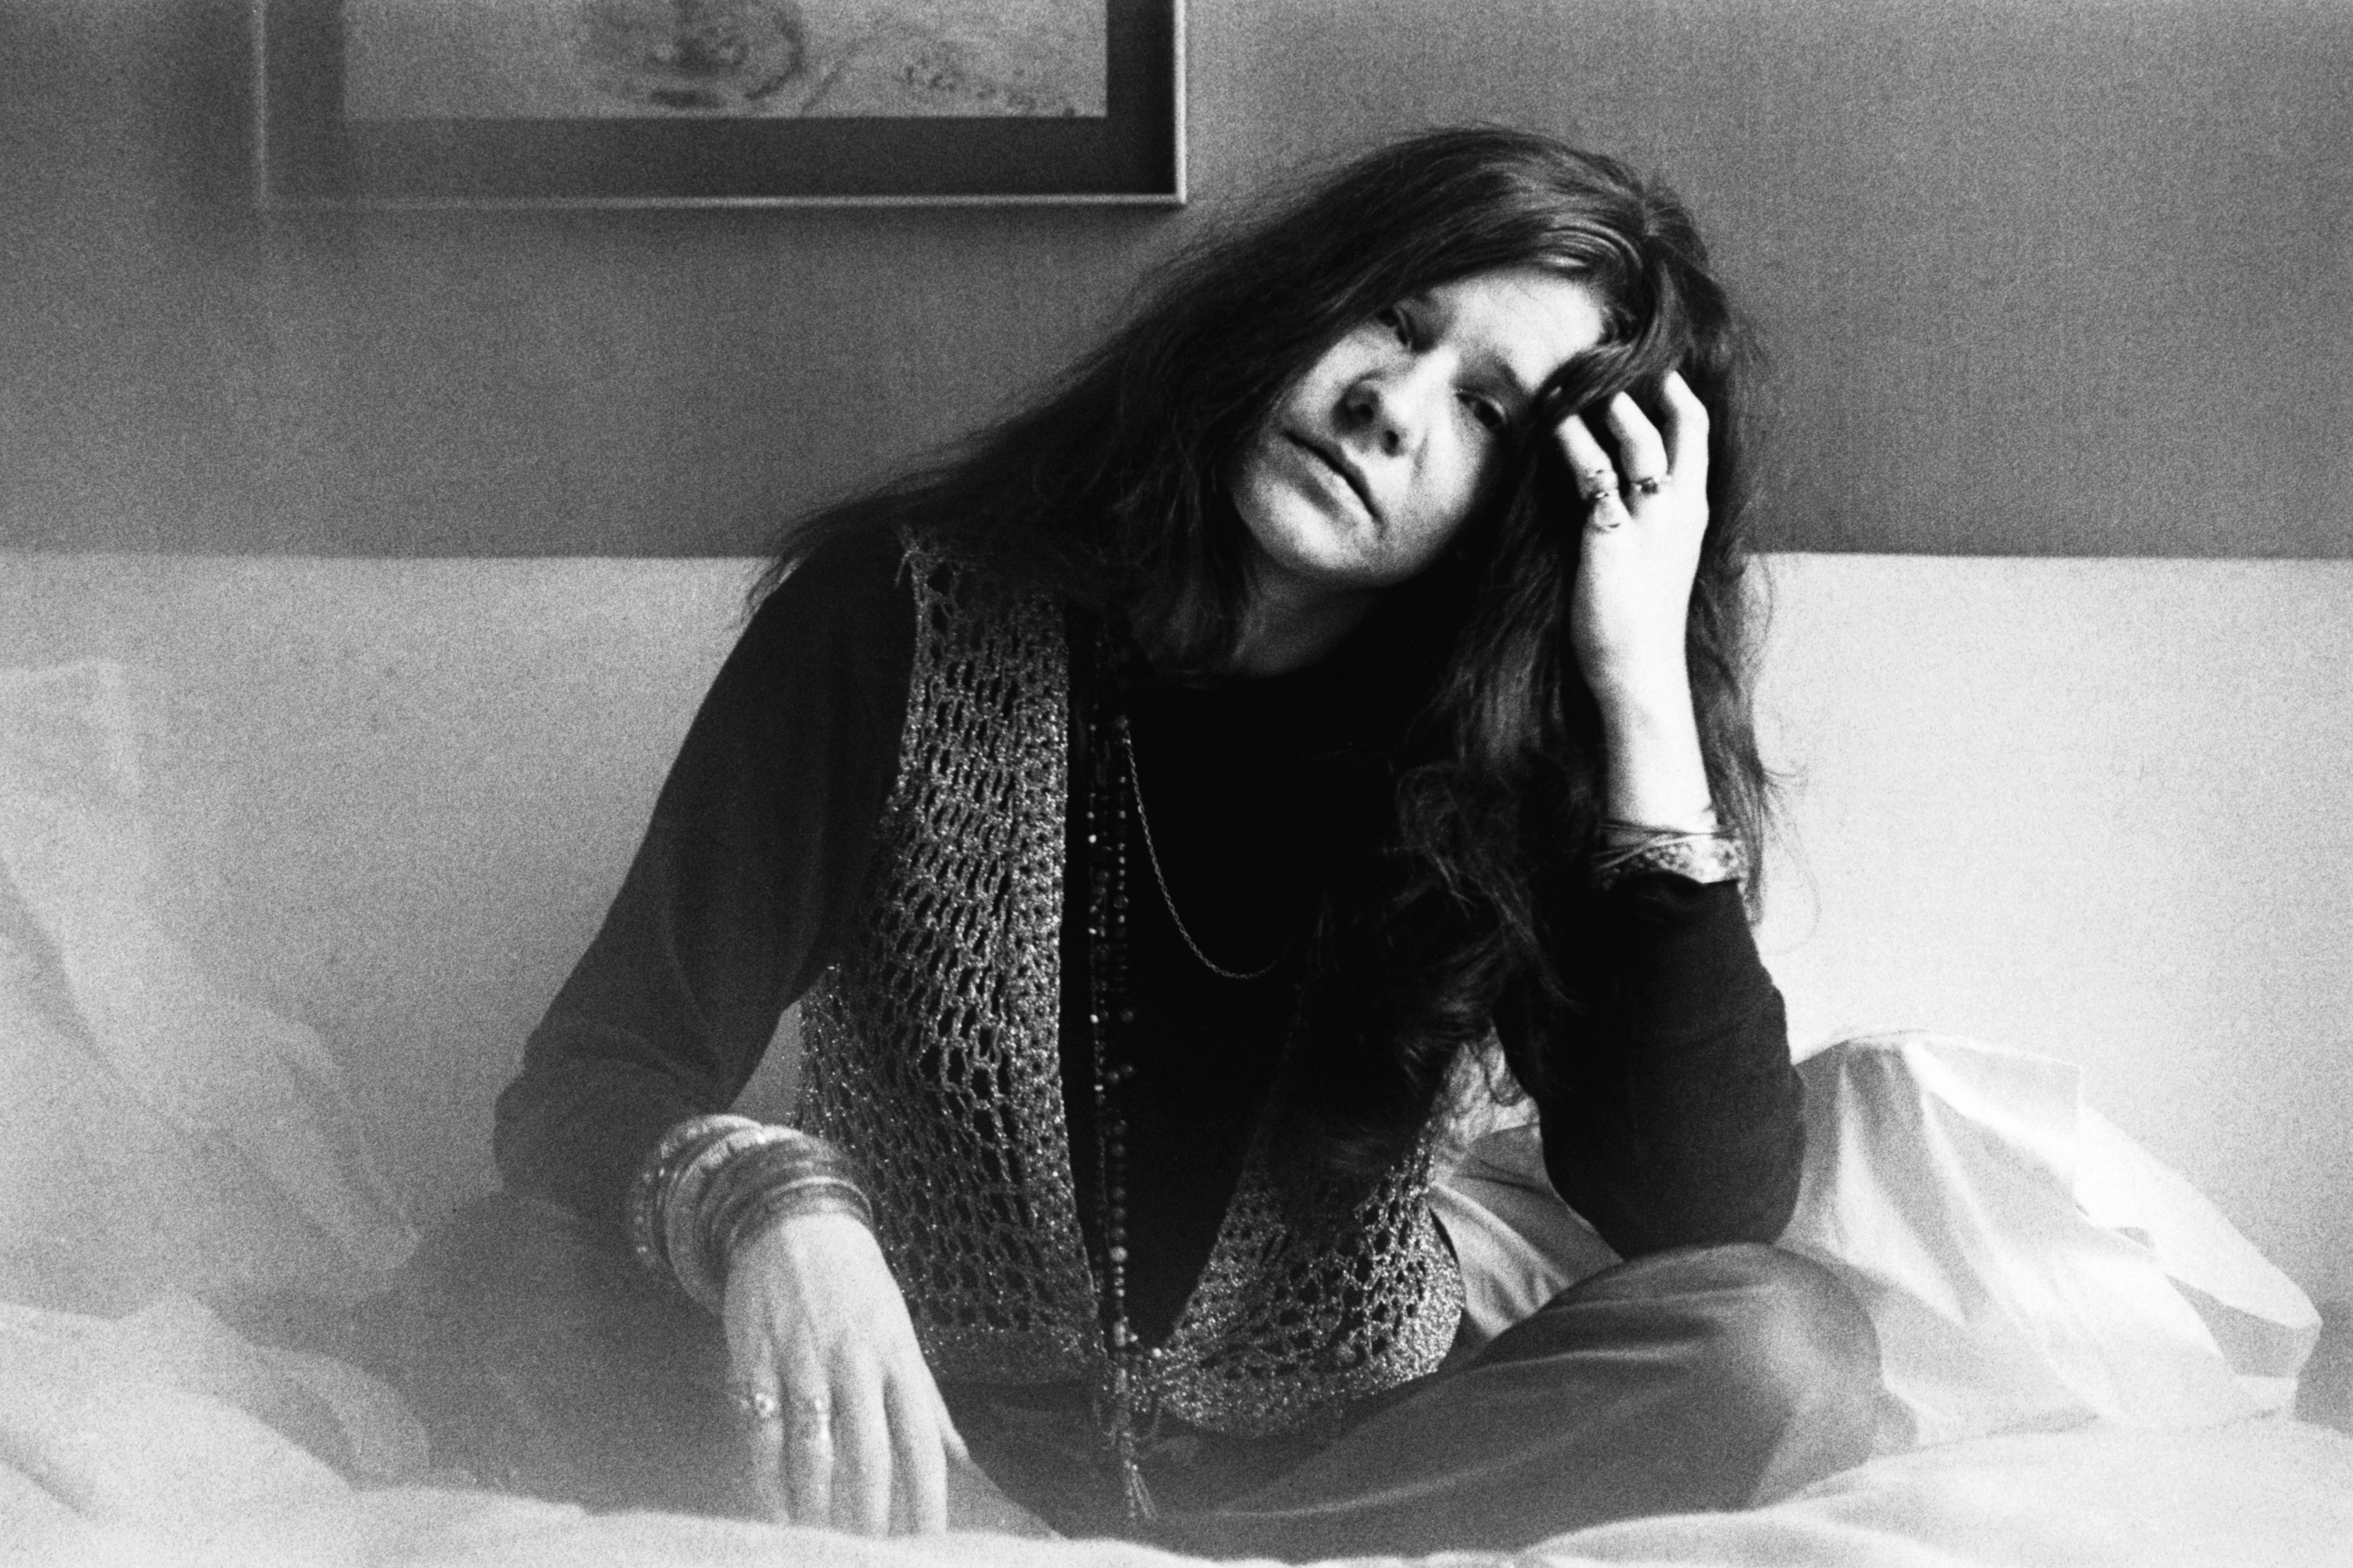 (Original Caption) American singer Janis Joplin, in London, 1969.